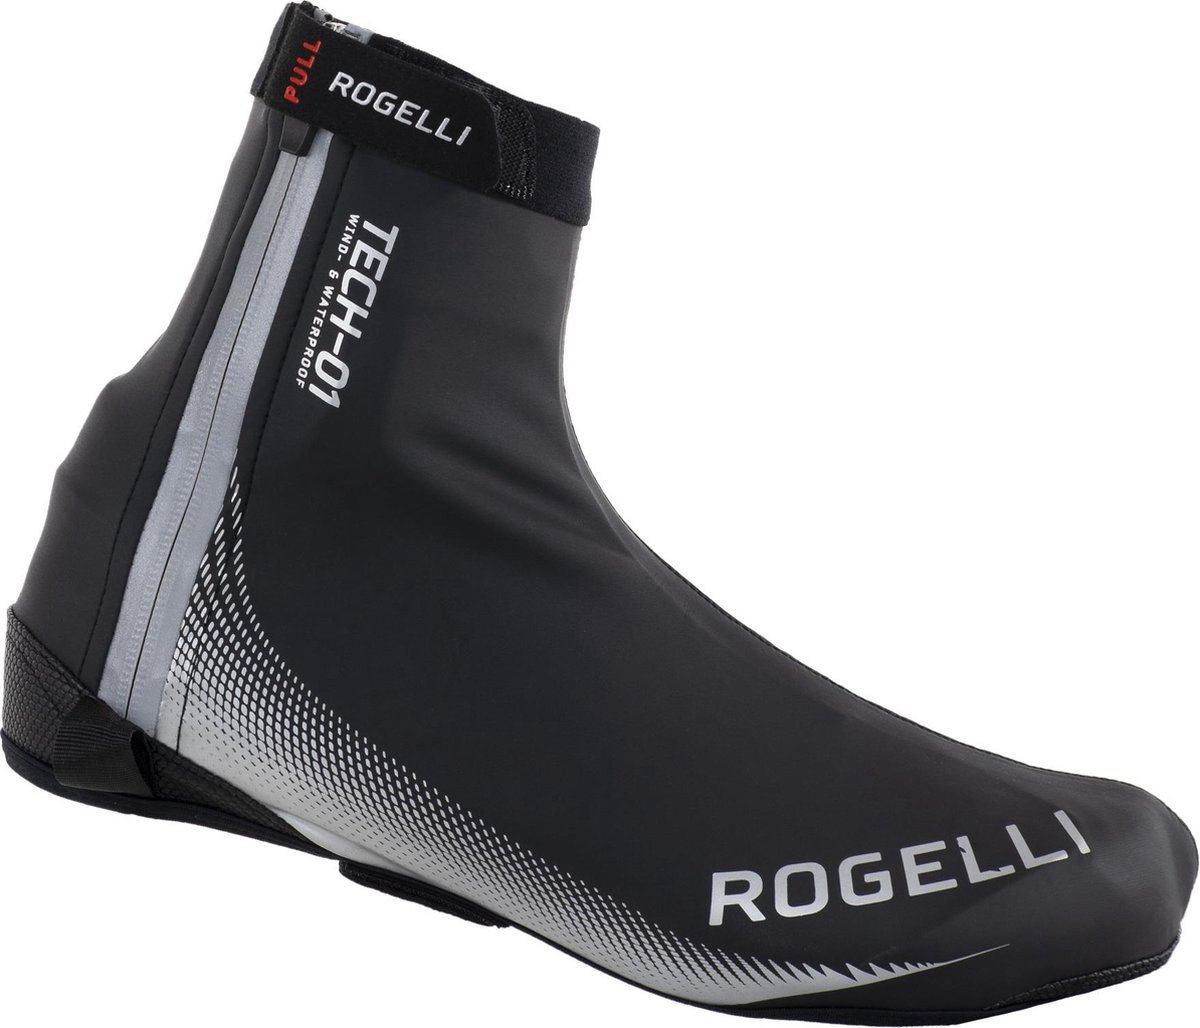 Rogelli Fiandrex Overschoenen Unisex - Maat 42-43 - Rogelli